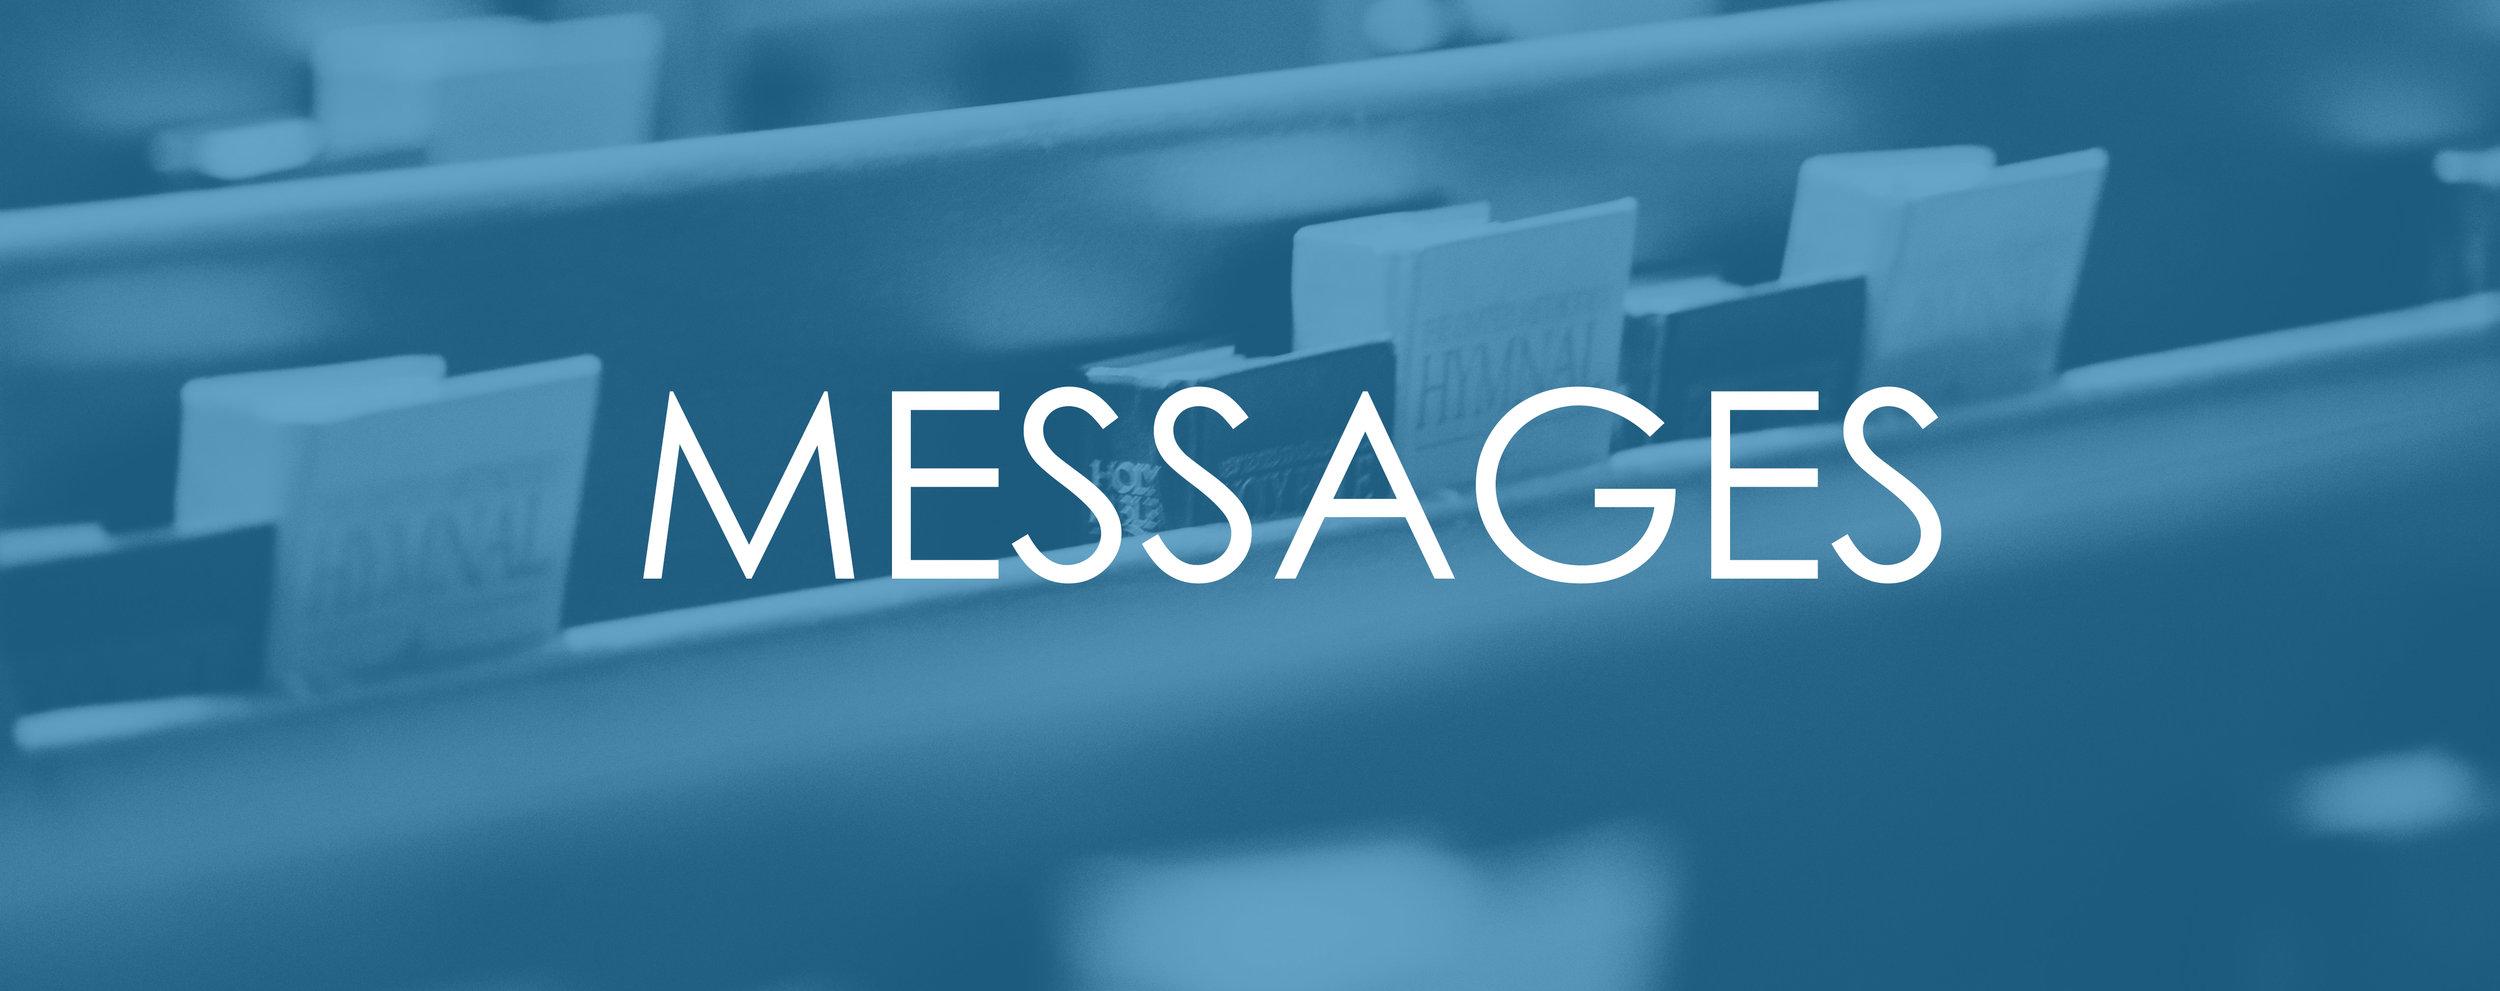 MESSAGES web banner.jpg